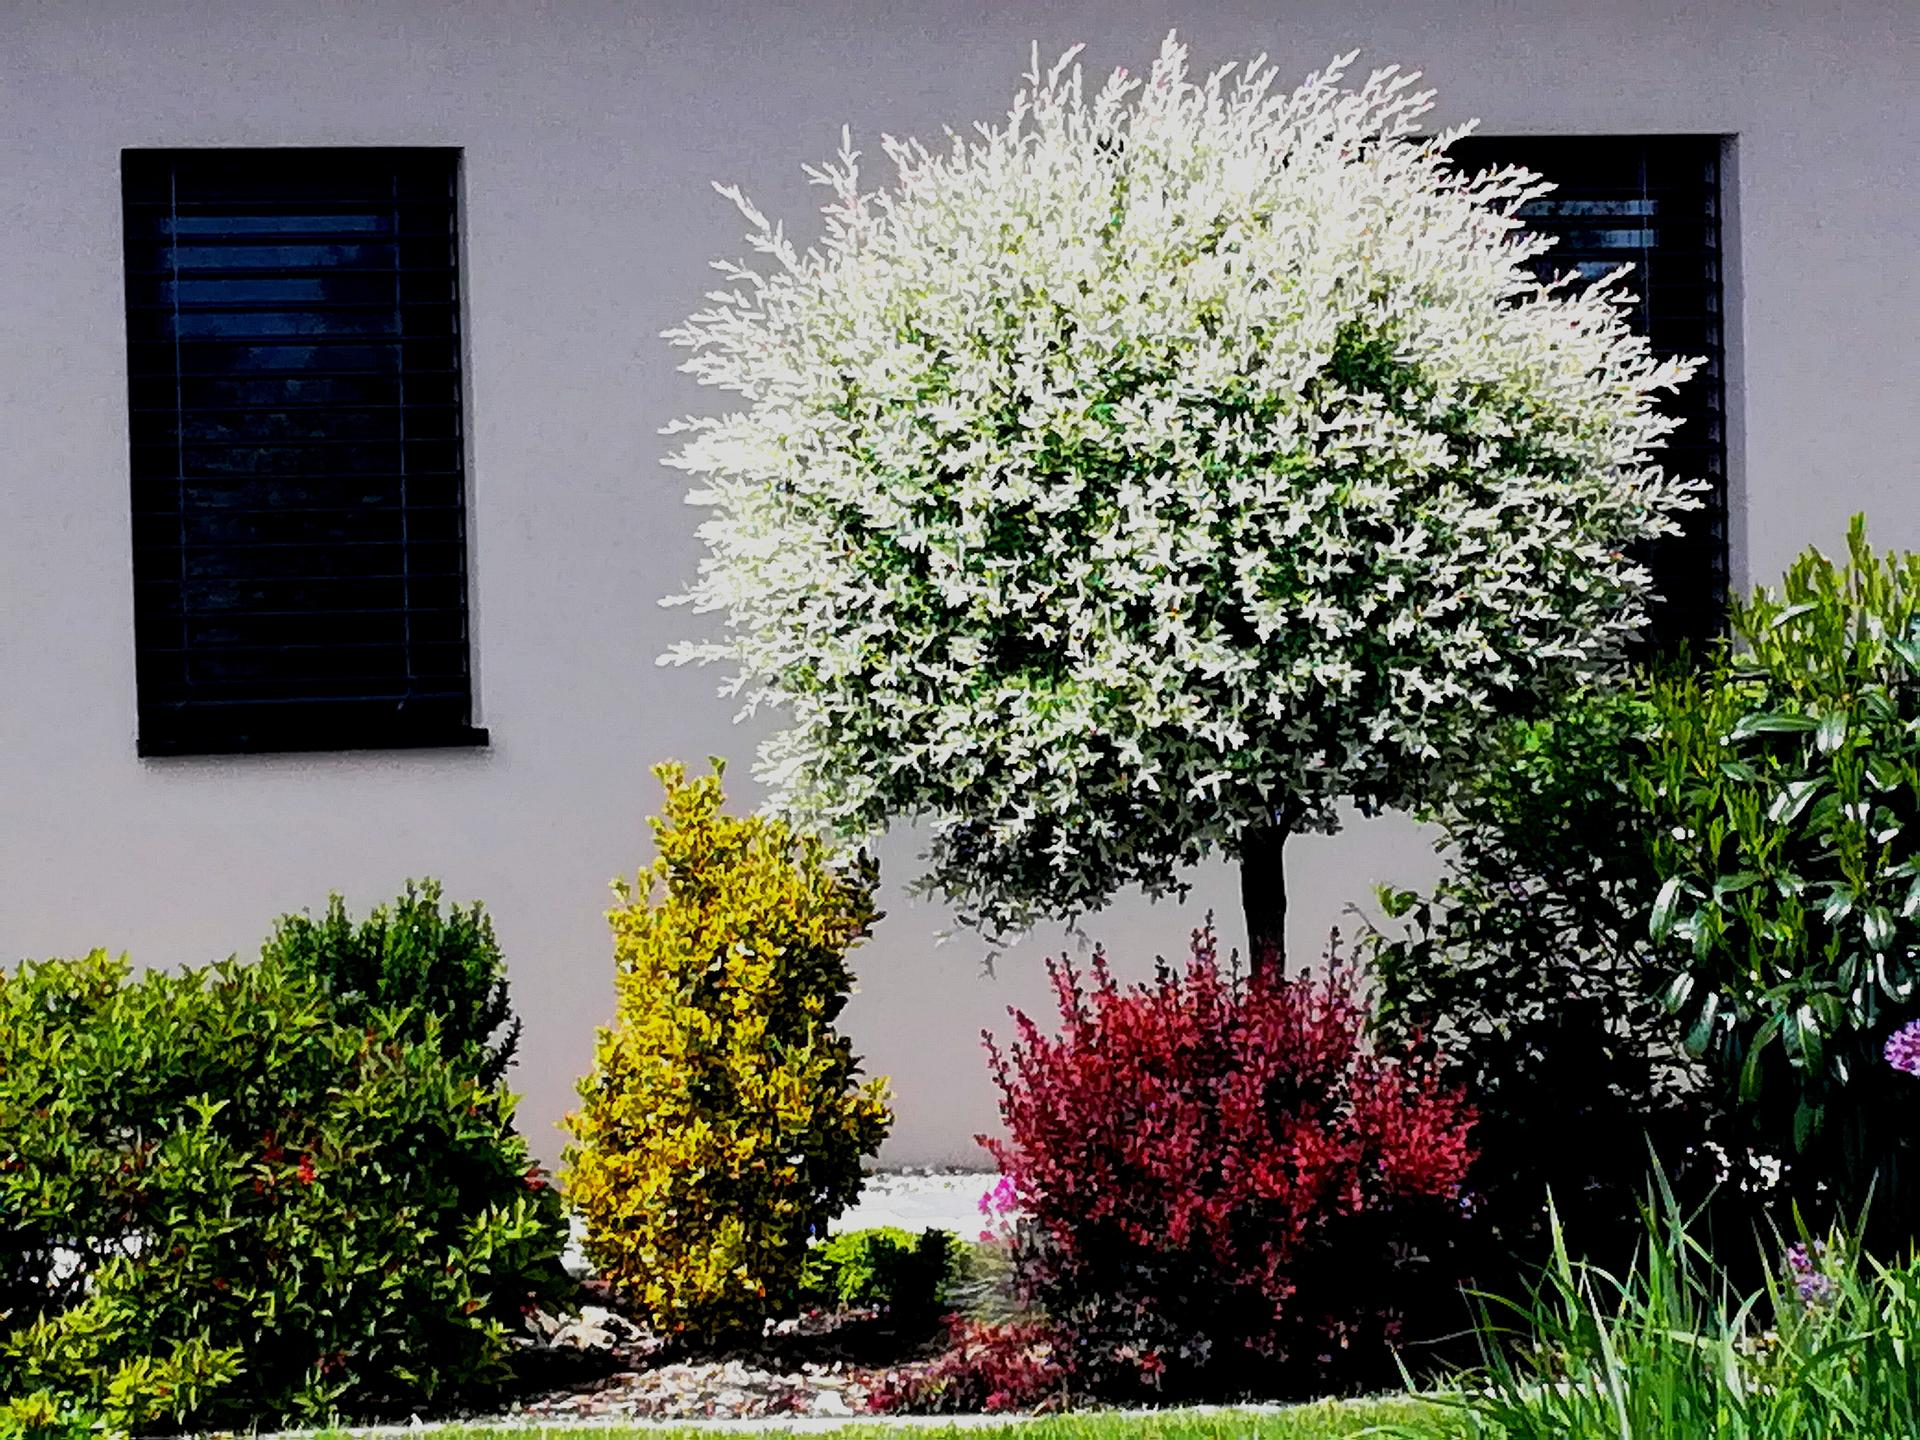 Zahrada 2021 🌲 - Obrázek č. 87